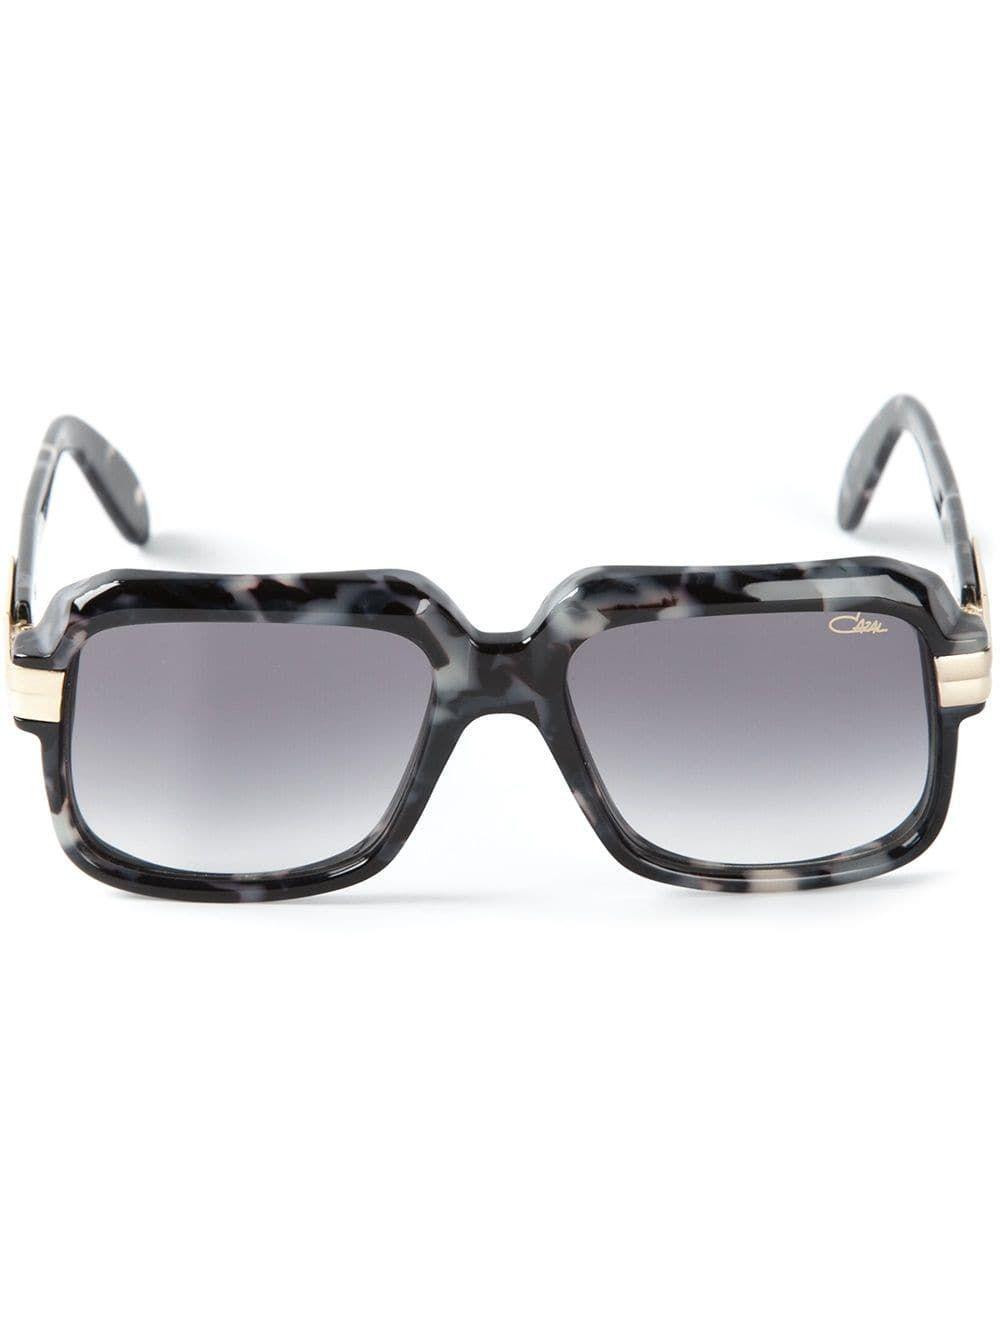 44a5299e4a6b Cazal Square Sunglasses in 2019 | Eyewear | Sunglasses, Eyewear, Glasses